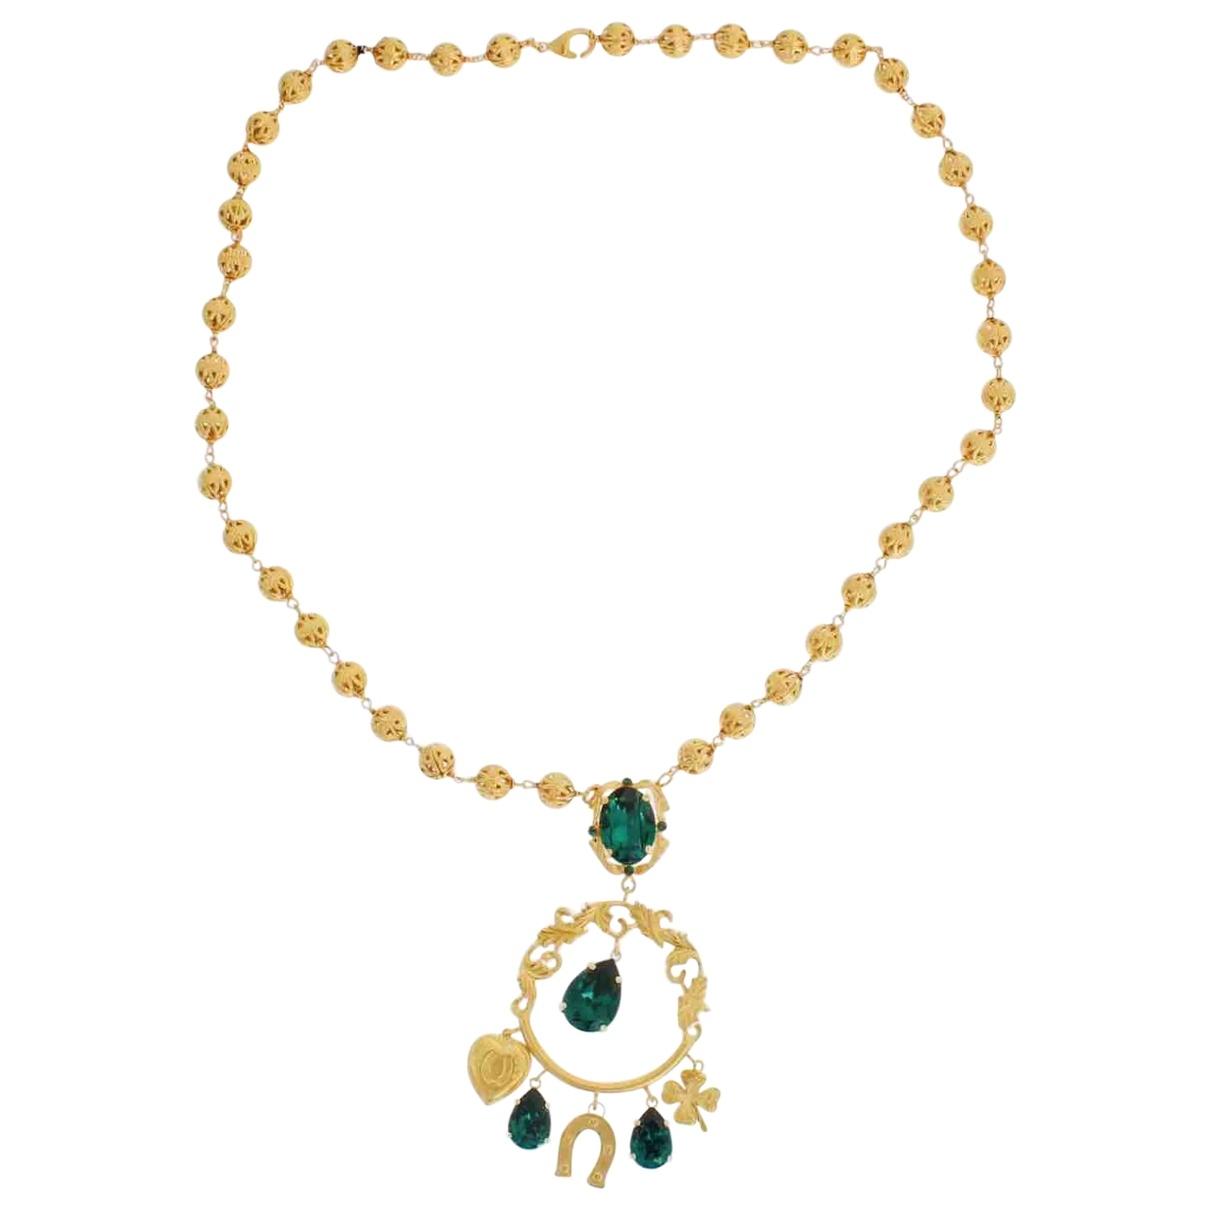 Dolce & Gabbana \N Kette in  Gruen Kristall